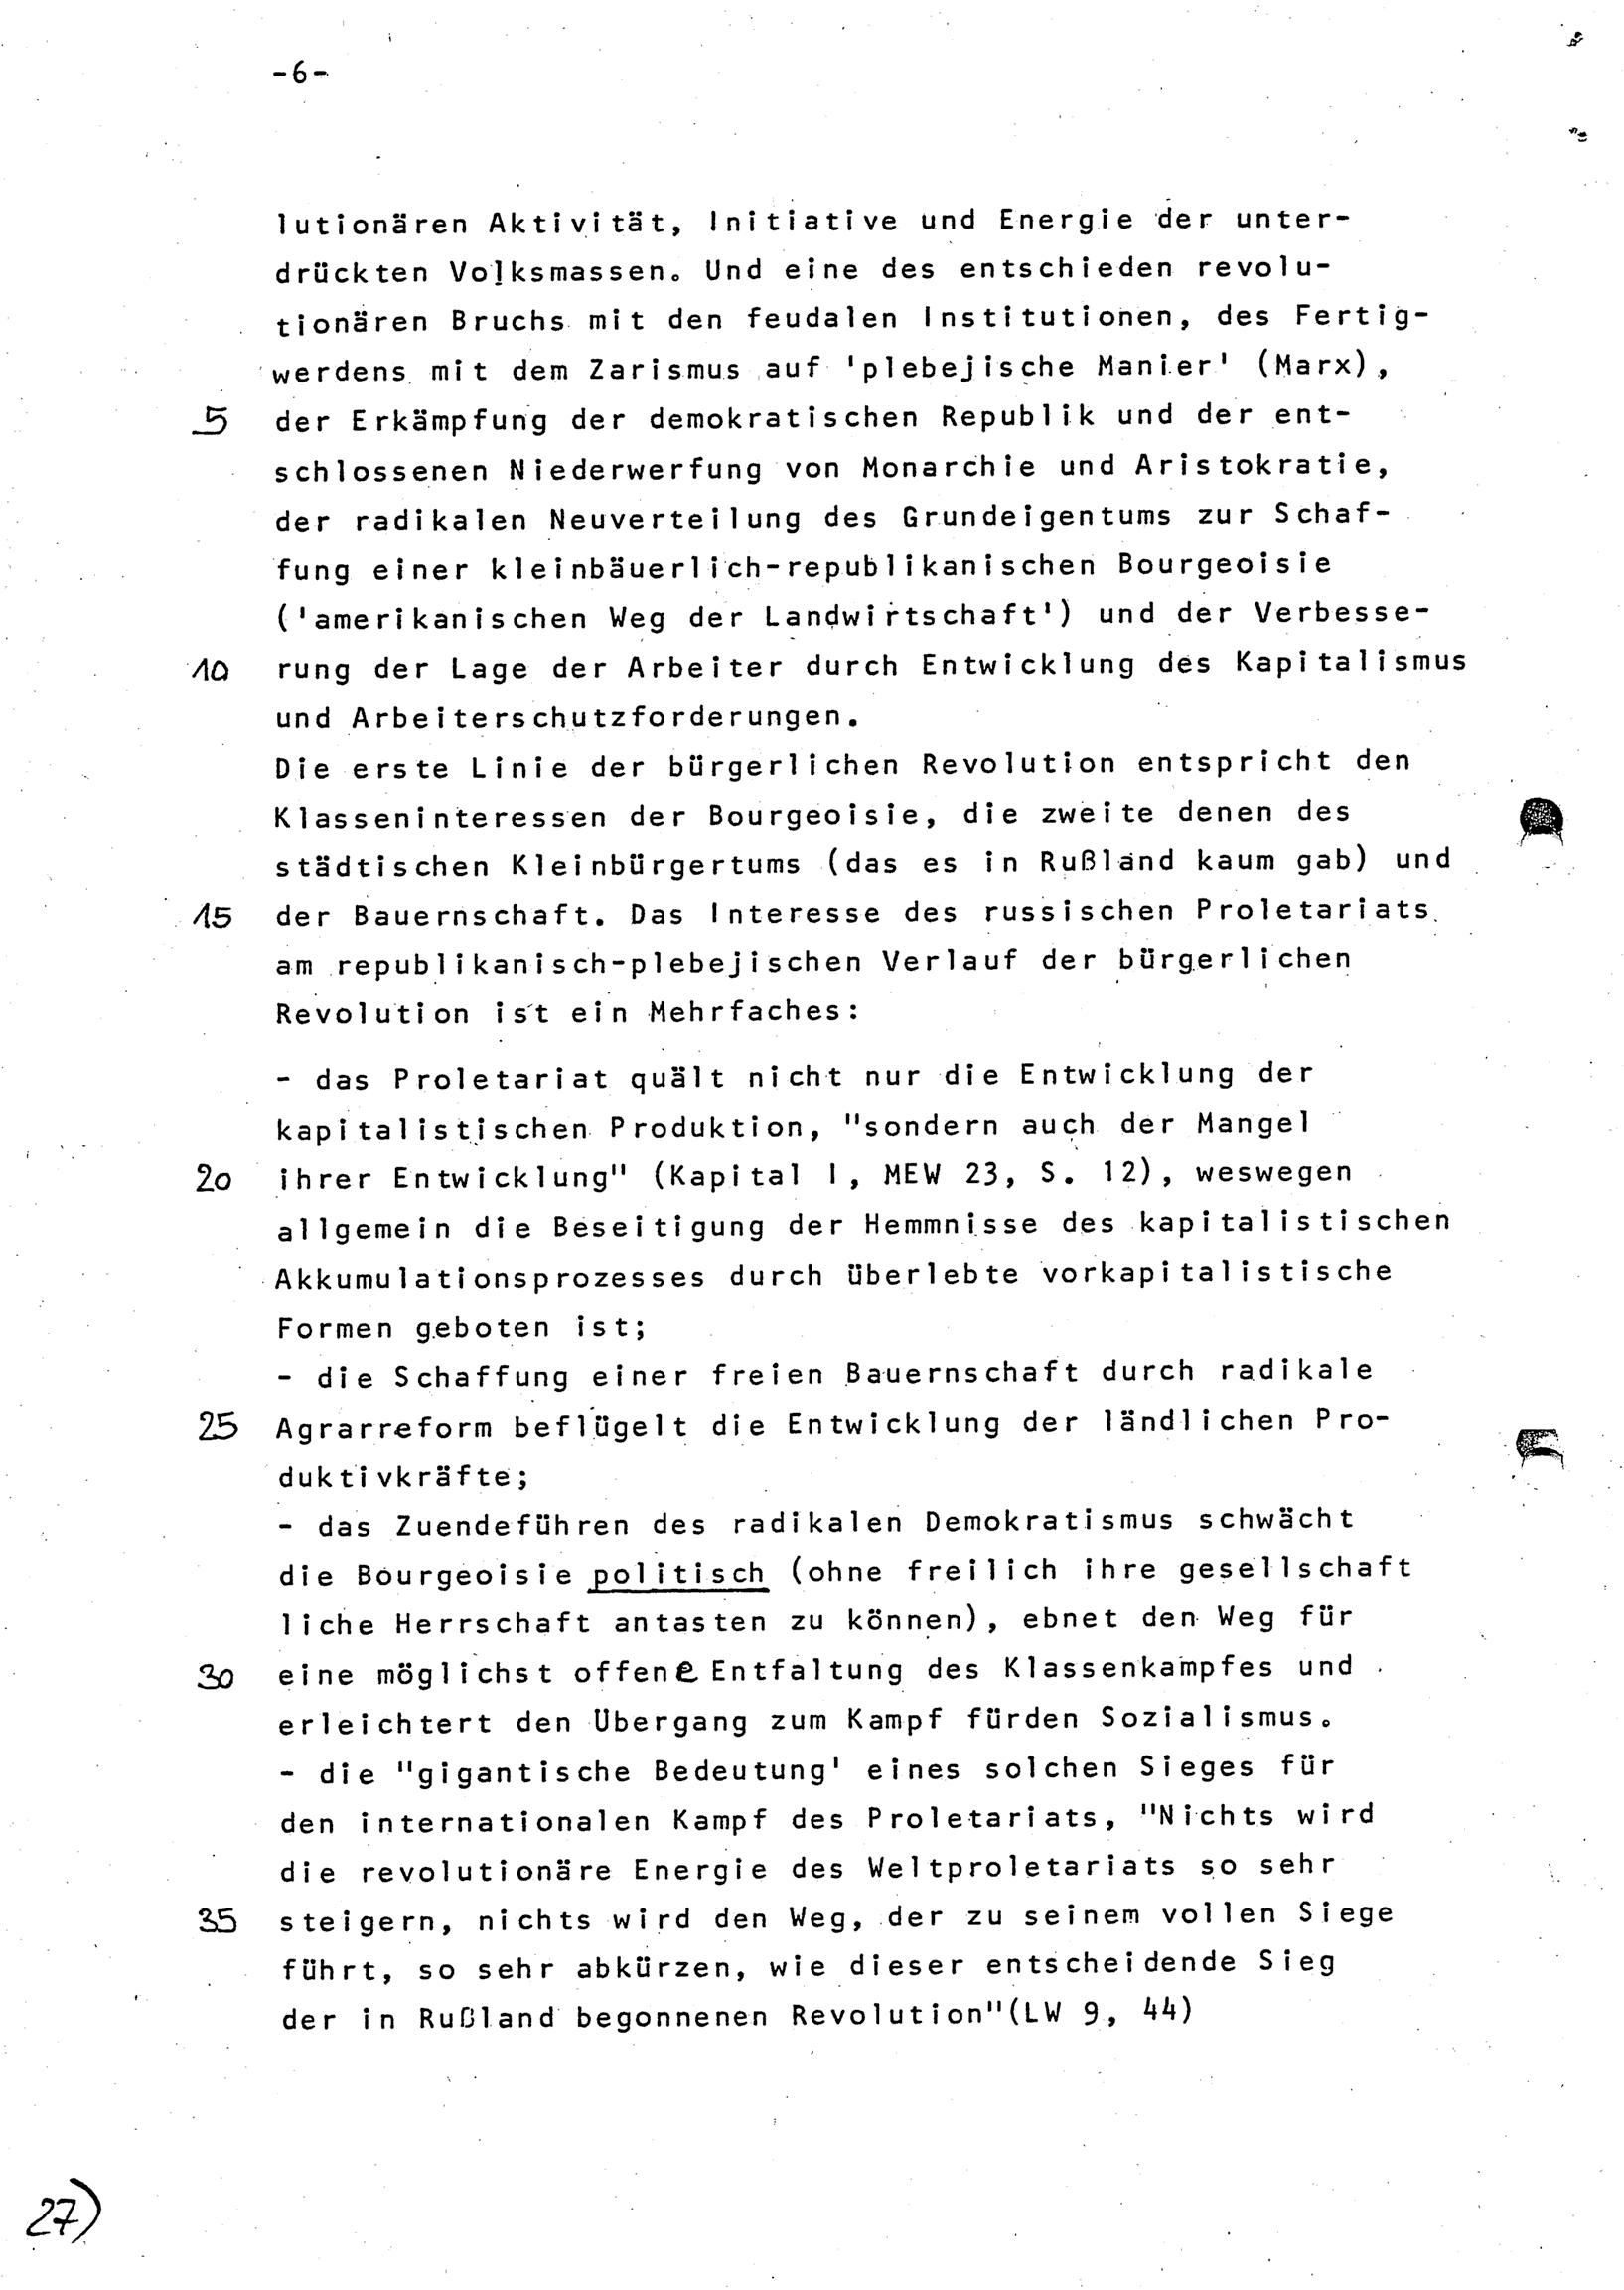 Ulm_KGU_Arbeitsheft_19830425_015_030